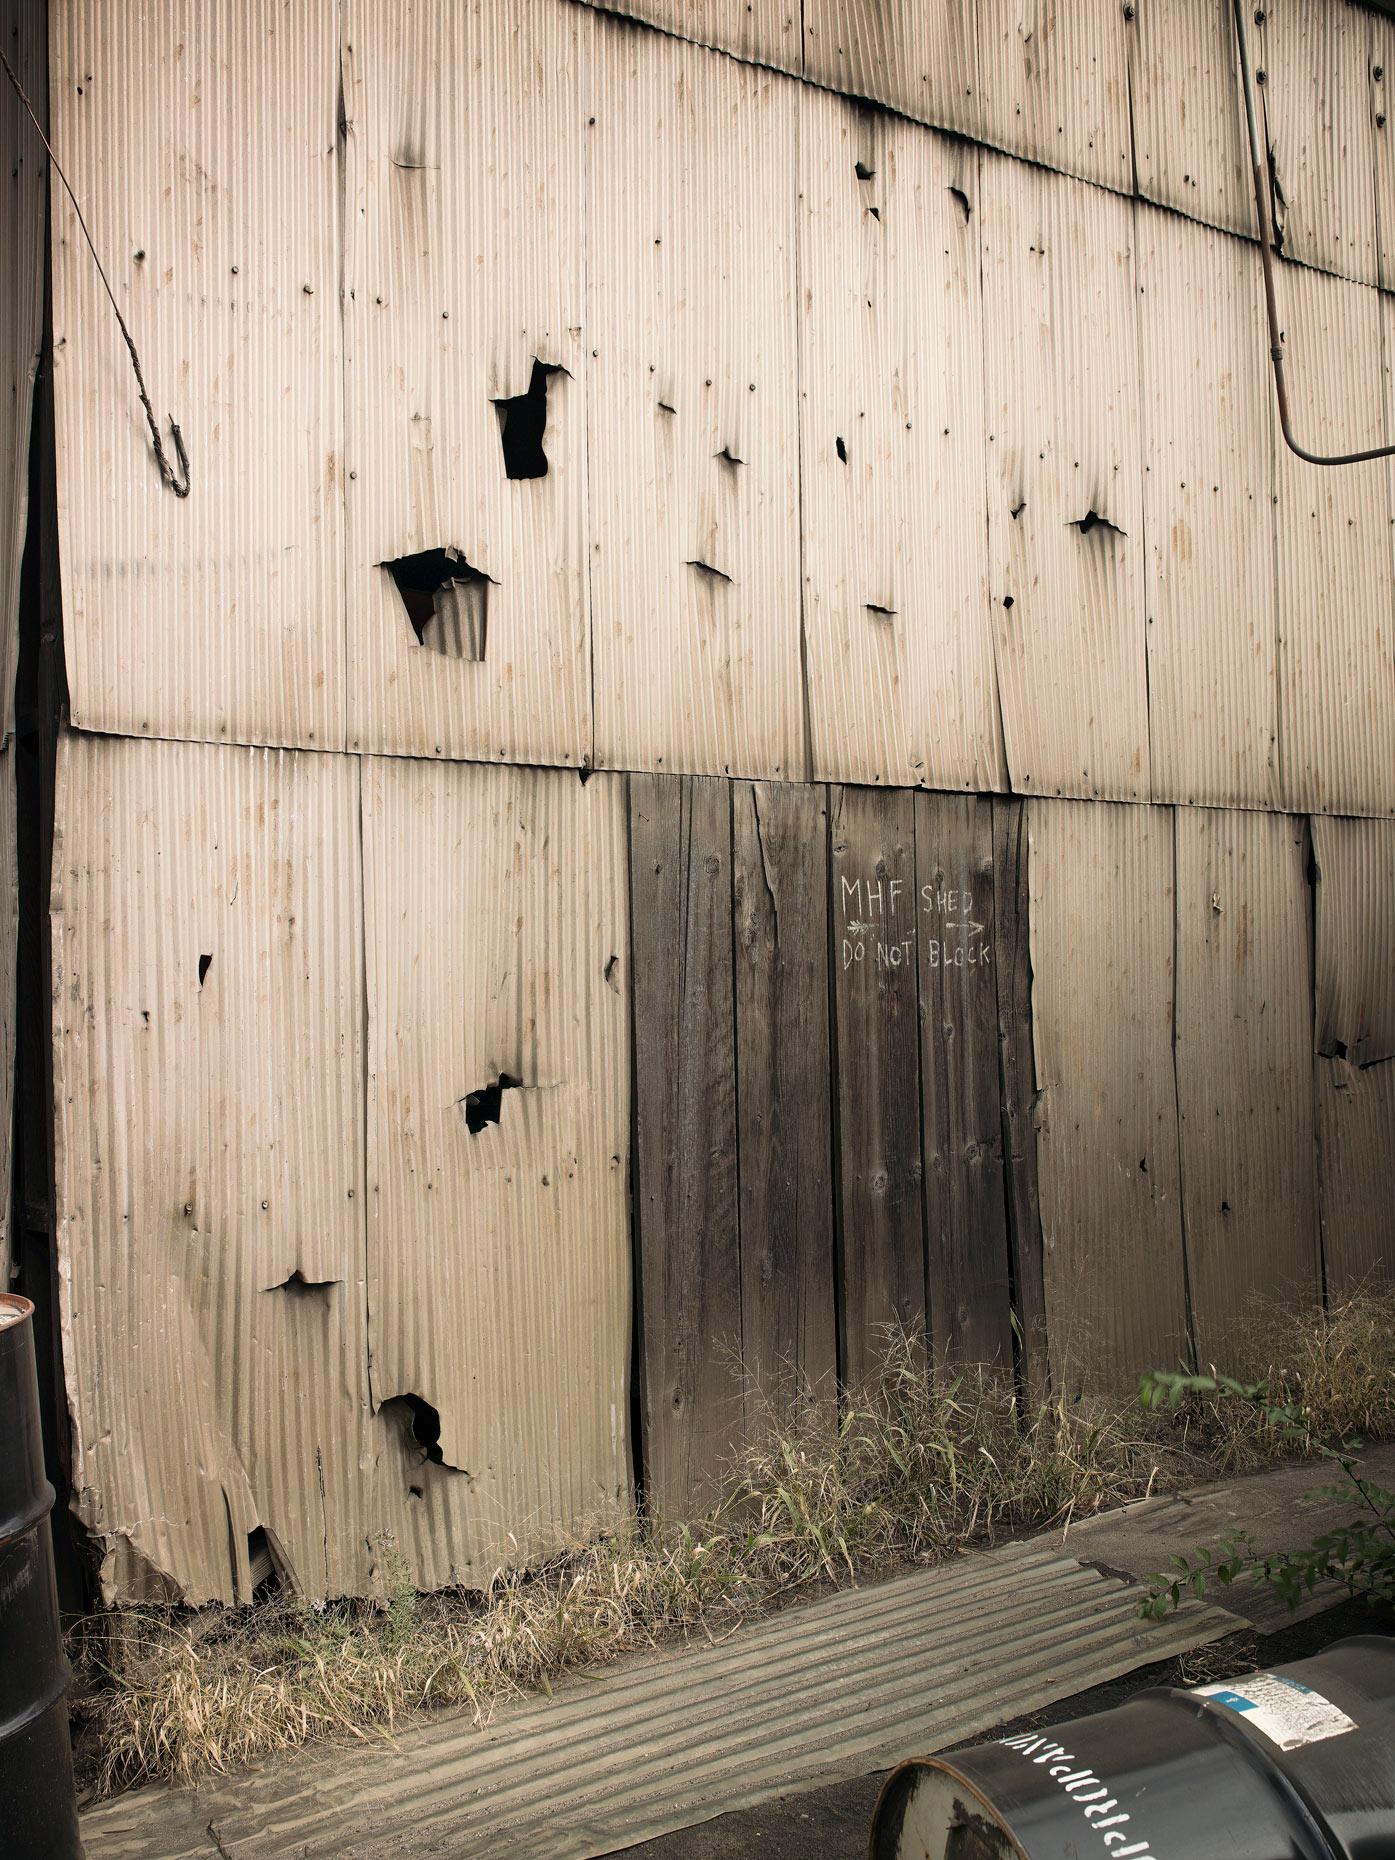 Projects-Editorial-Photography-Derek-Israelsen-020-Tin_Wall.jpg